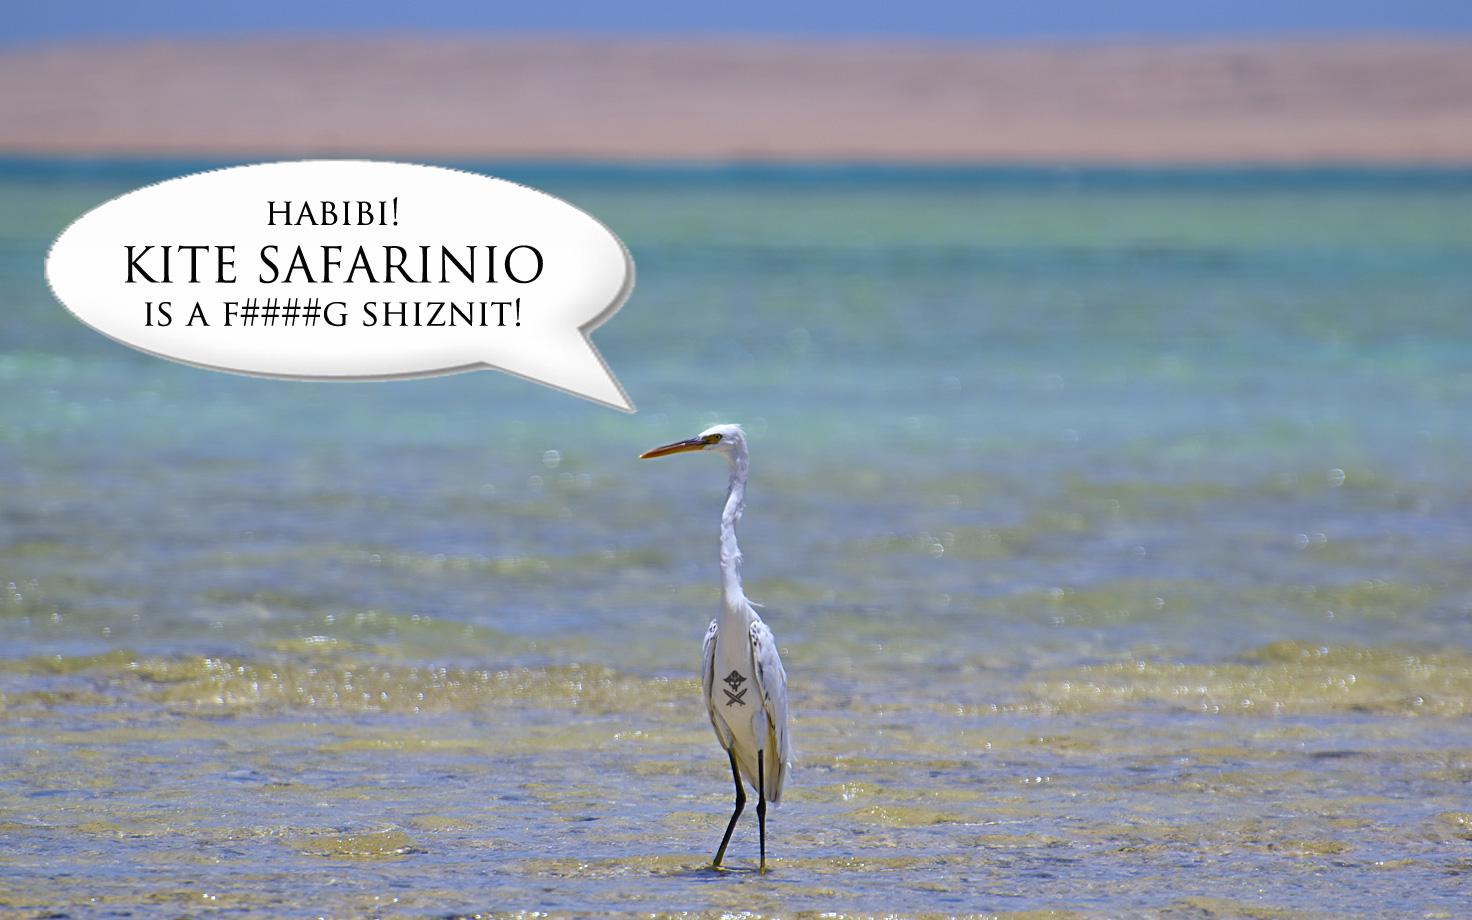 kite safarinio is the shiznit